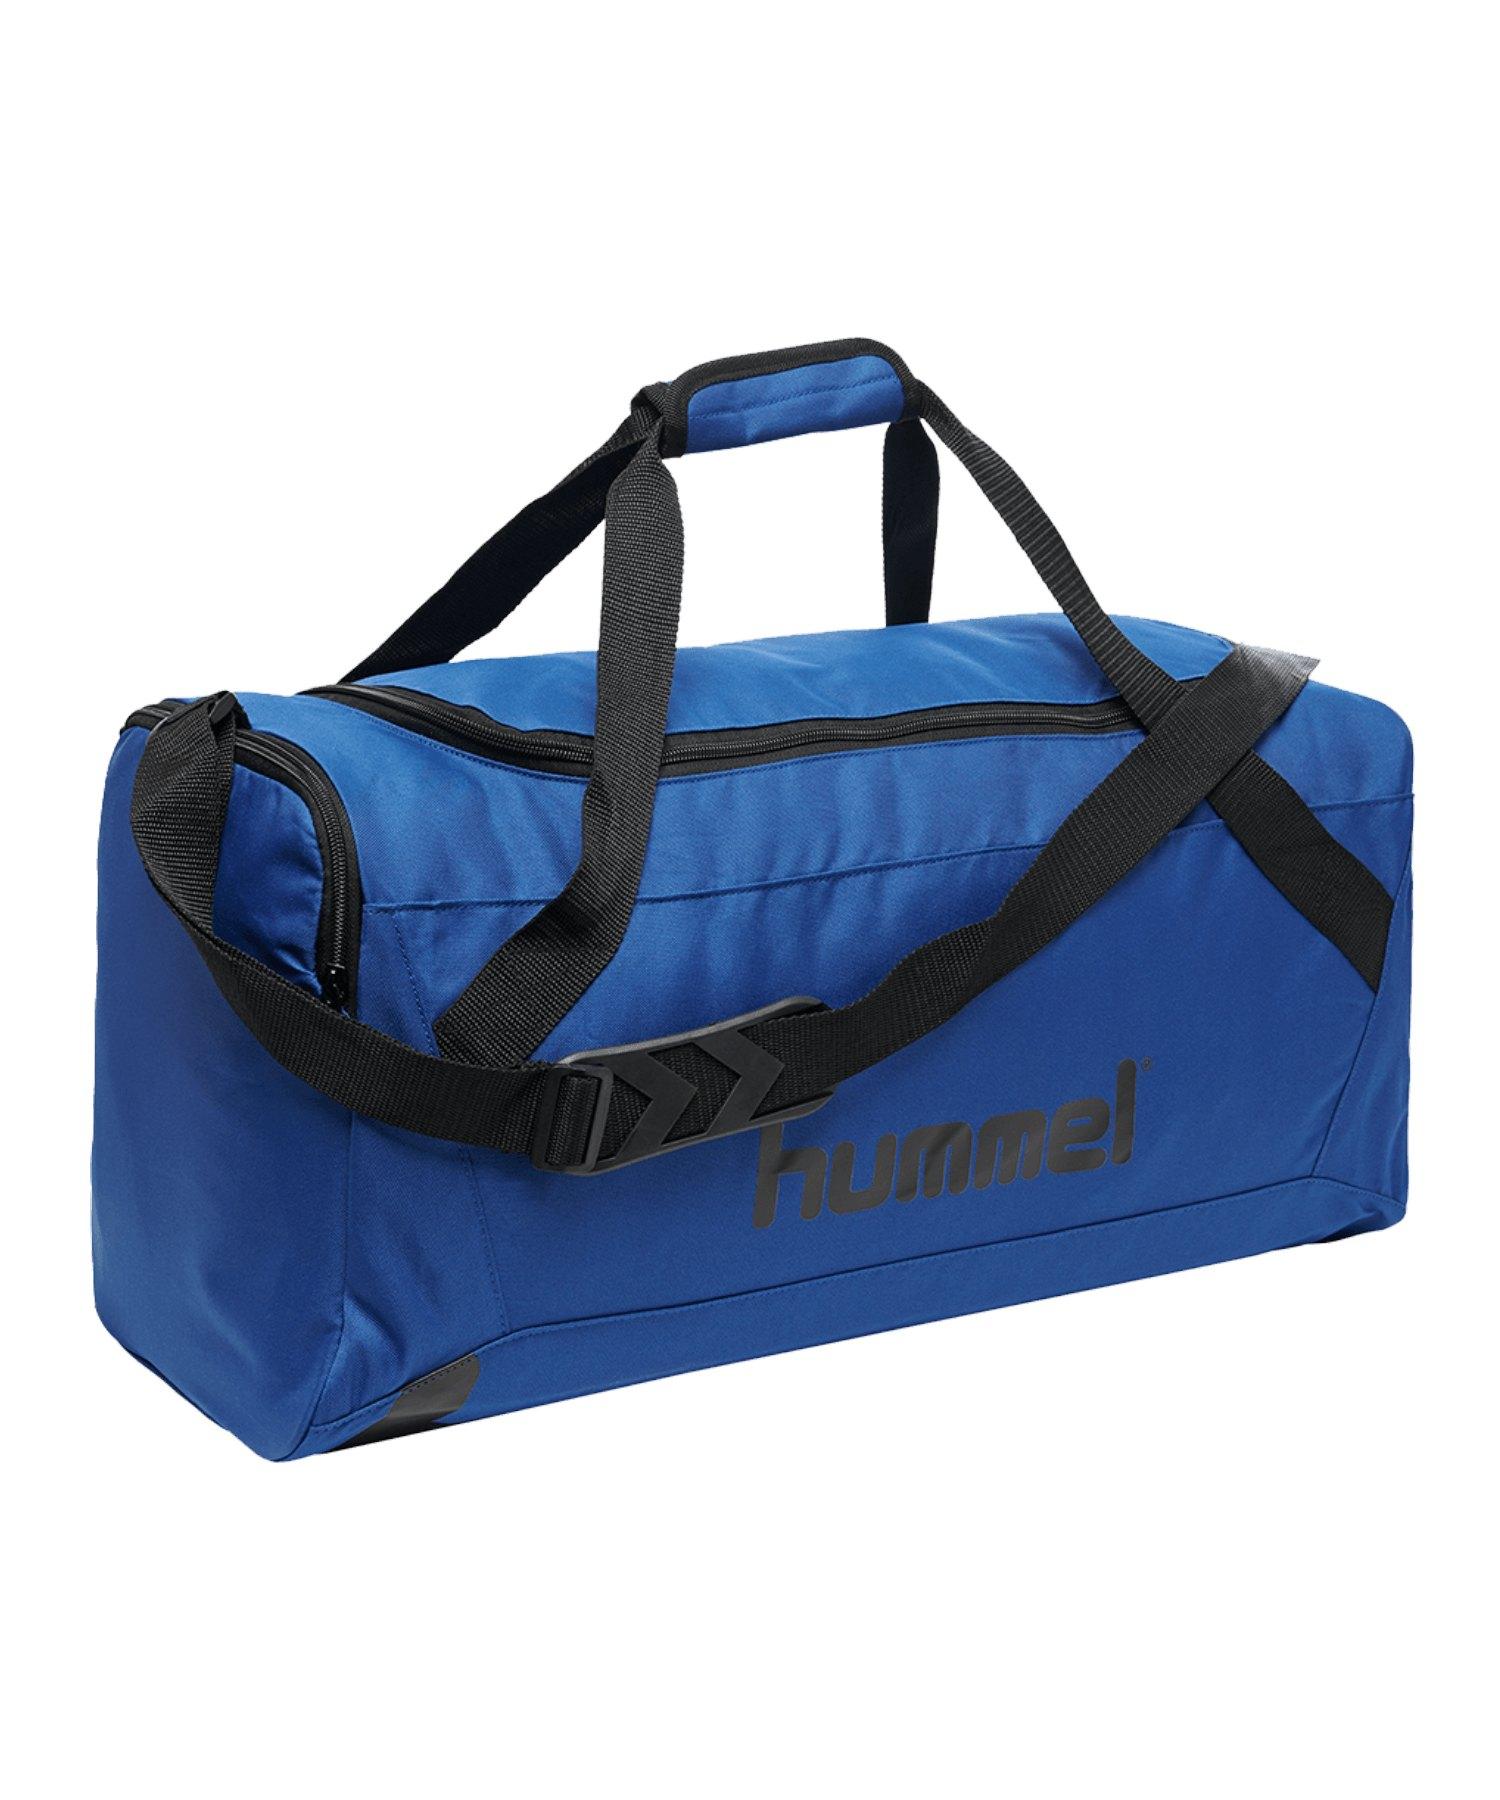 Hummel Core Bag Sporttasche Blau F7079 Gr.M - blau